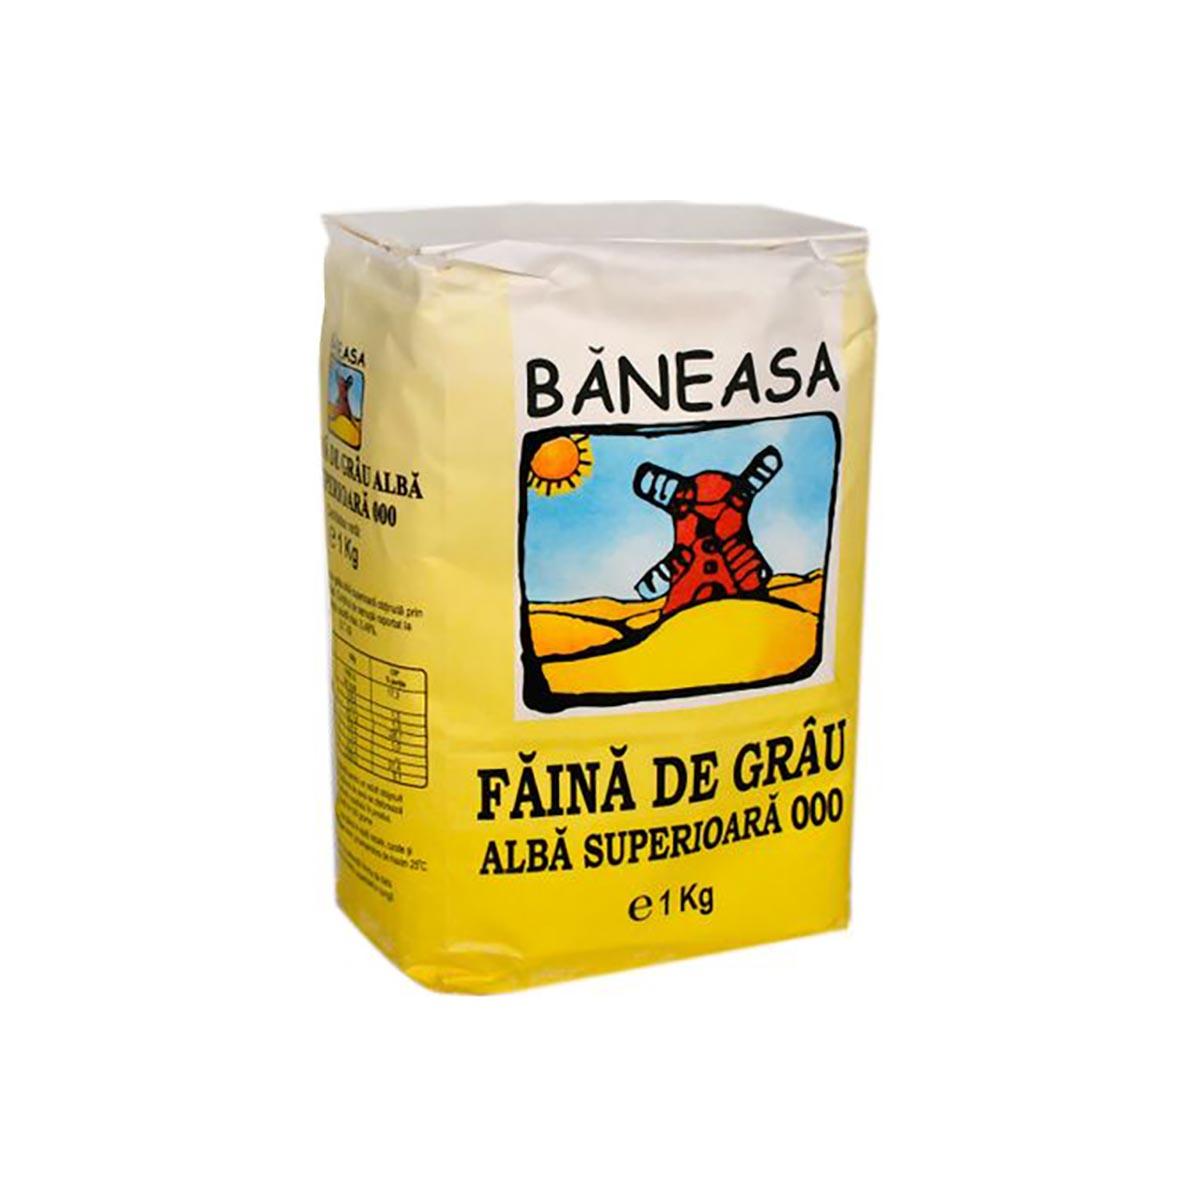 Faina de grau alba superioara Baneasa, 000, 1 kg